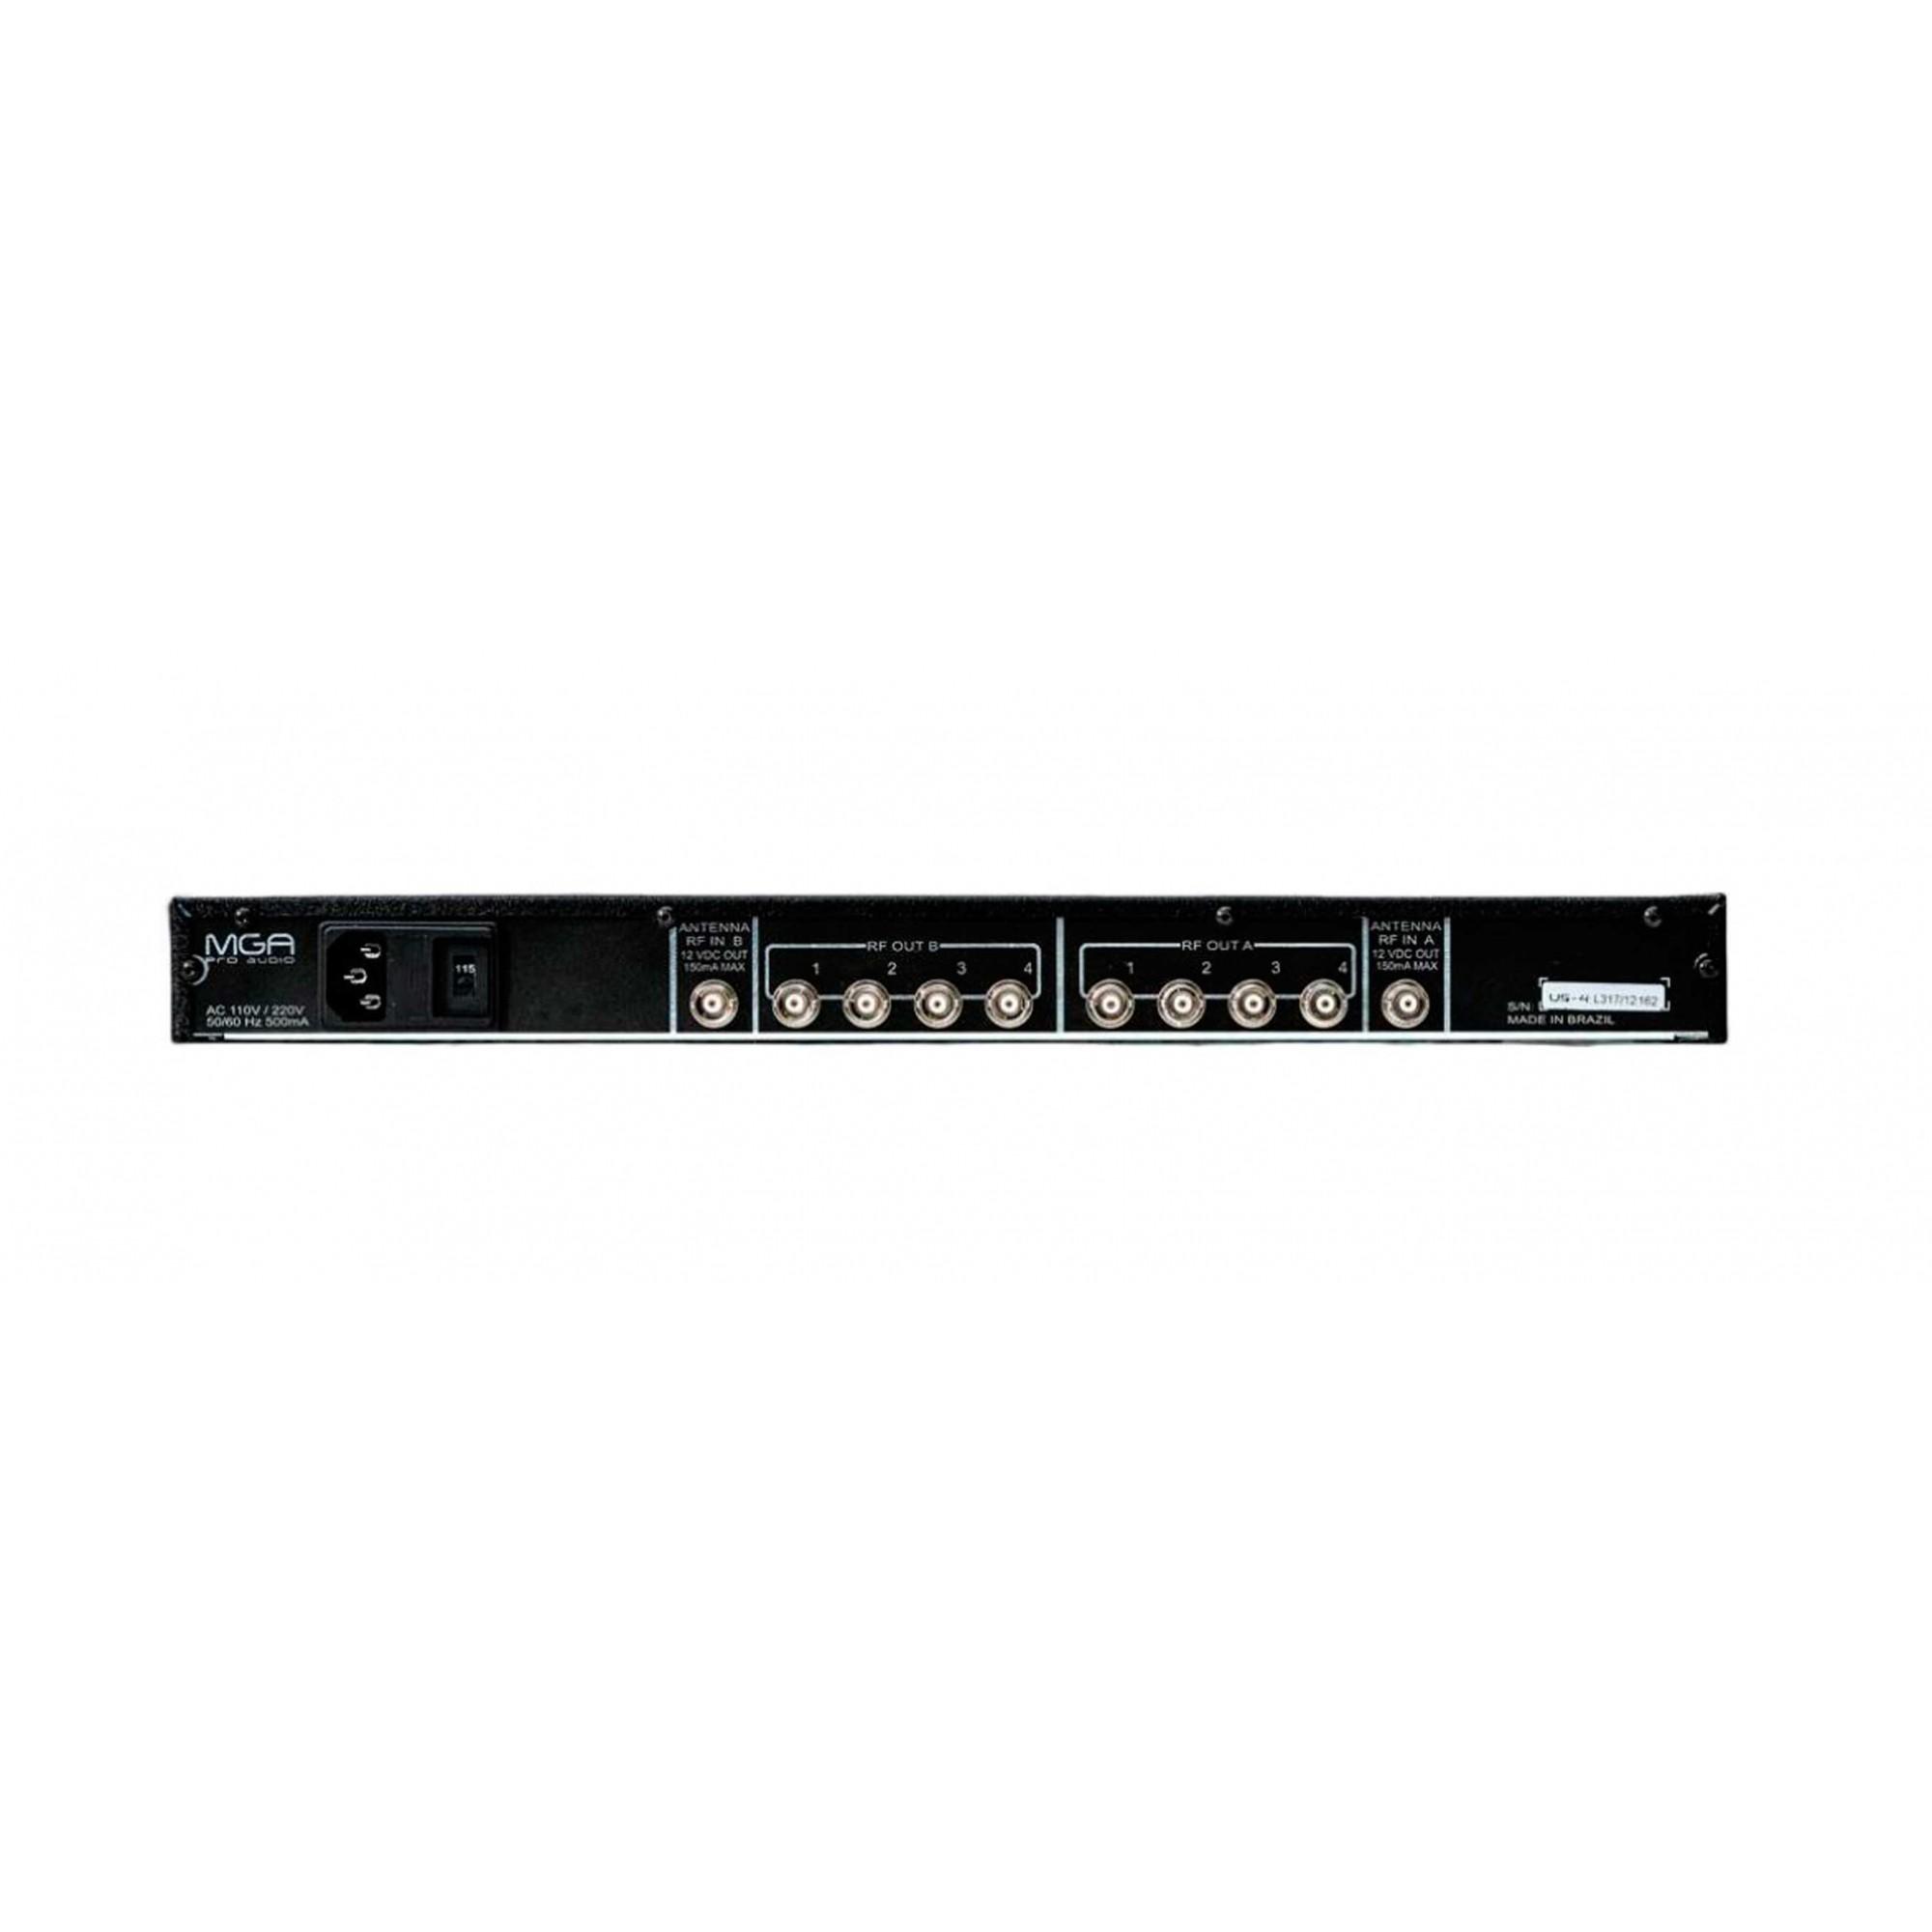 Sistema RF Microfone - 1 US4 + 2 A1 MGA Pro Audio